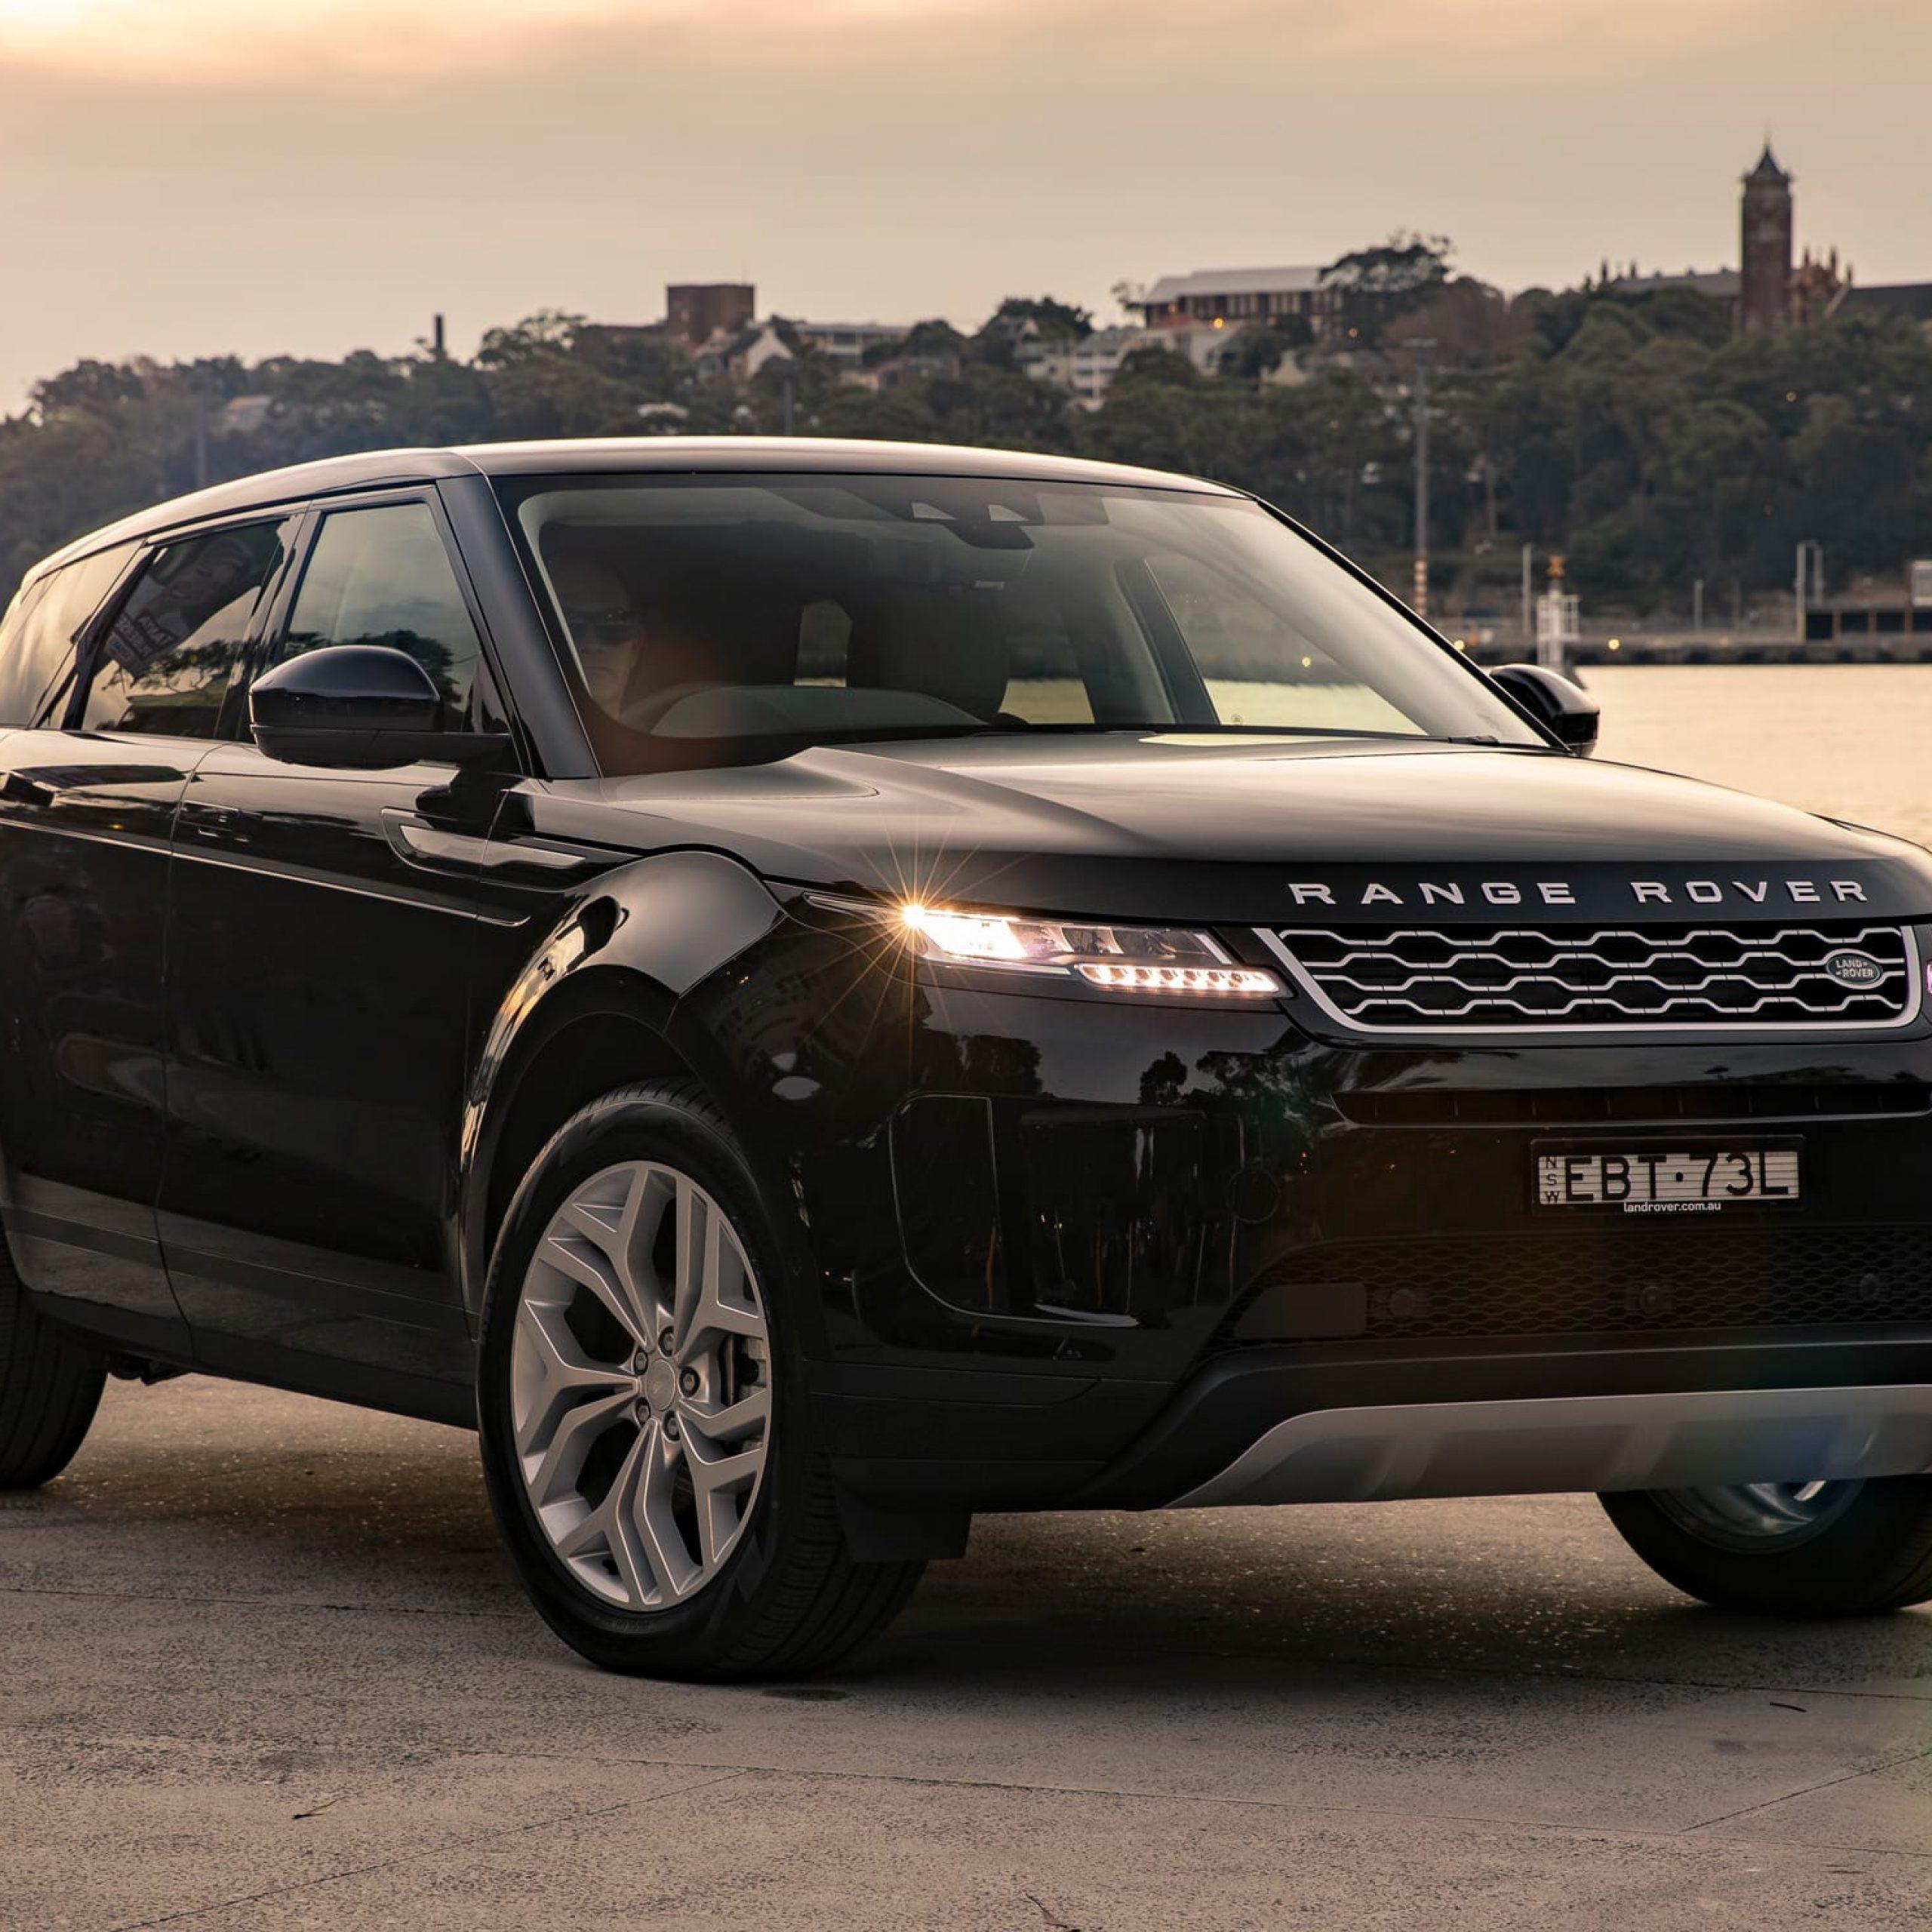 Range Rover Evoque- Variants and Specs - GoodAutoDeals